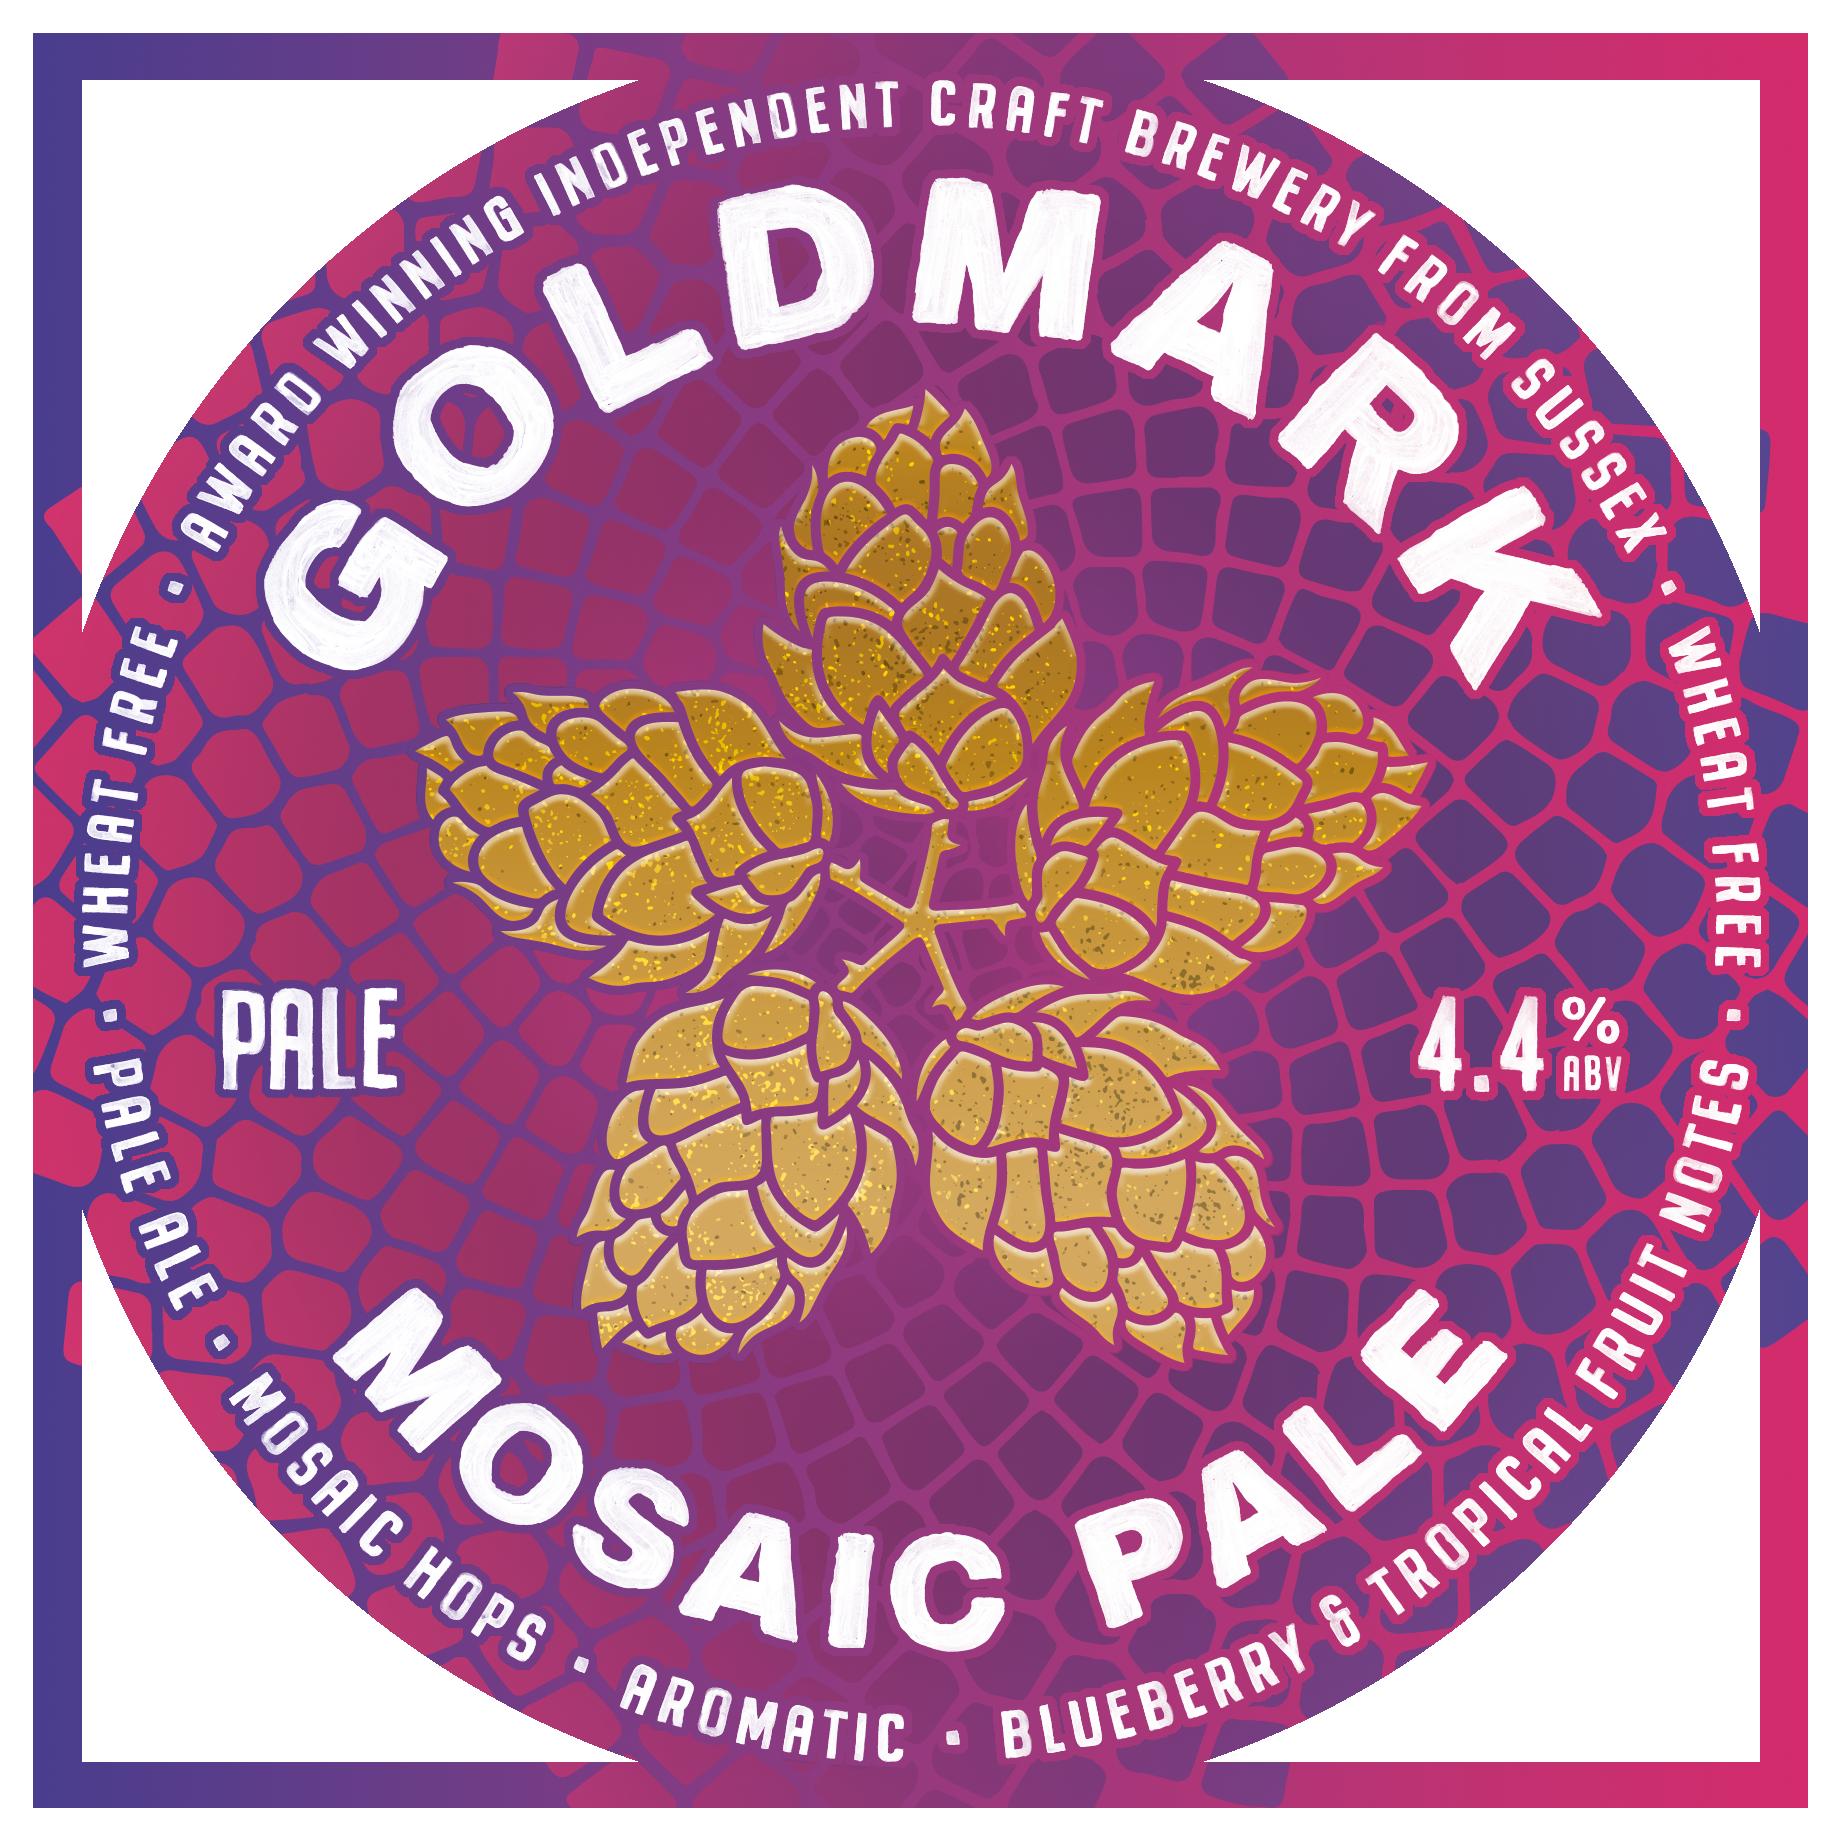 Goldmark Mosaic Pale Ale 4.4%